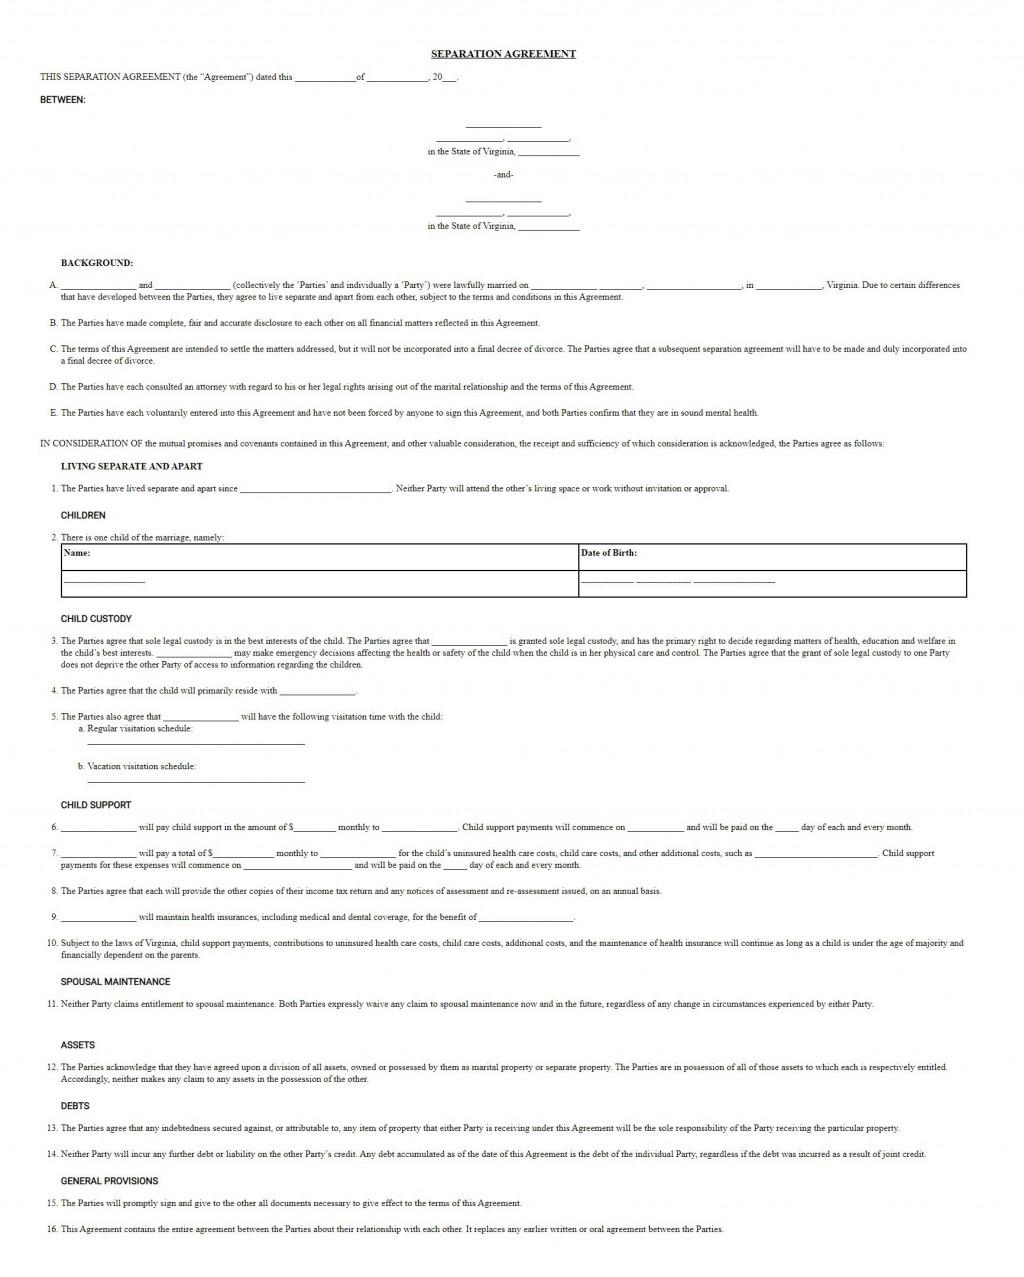 004 Astounding Virginia Separation Agreement Template Inspiration  Marital MarriageLarge